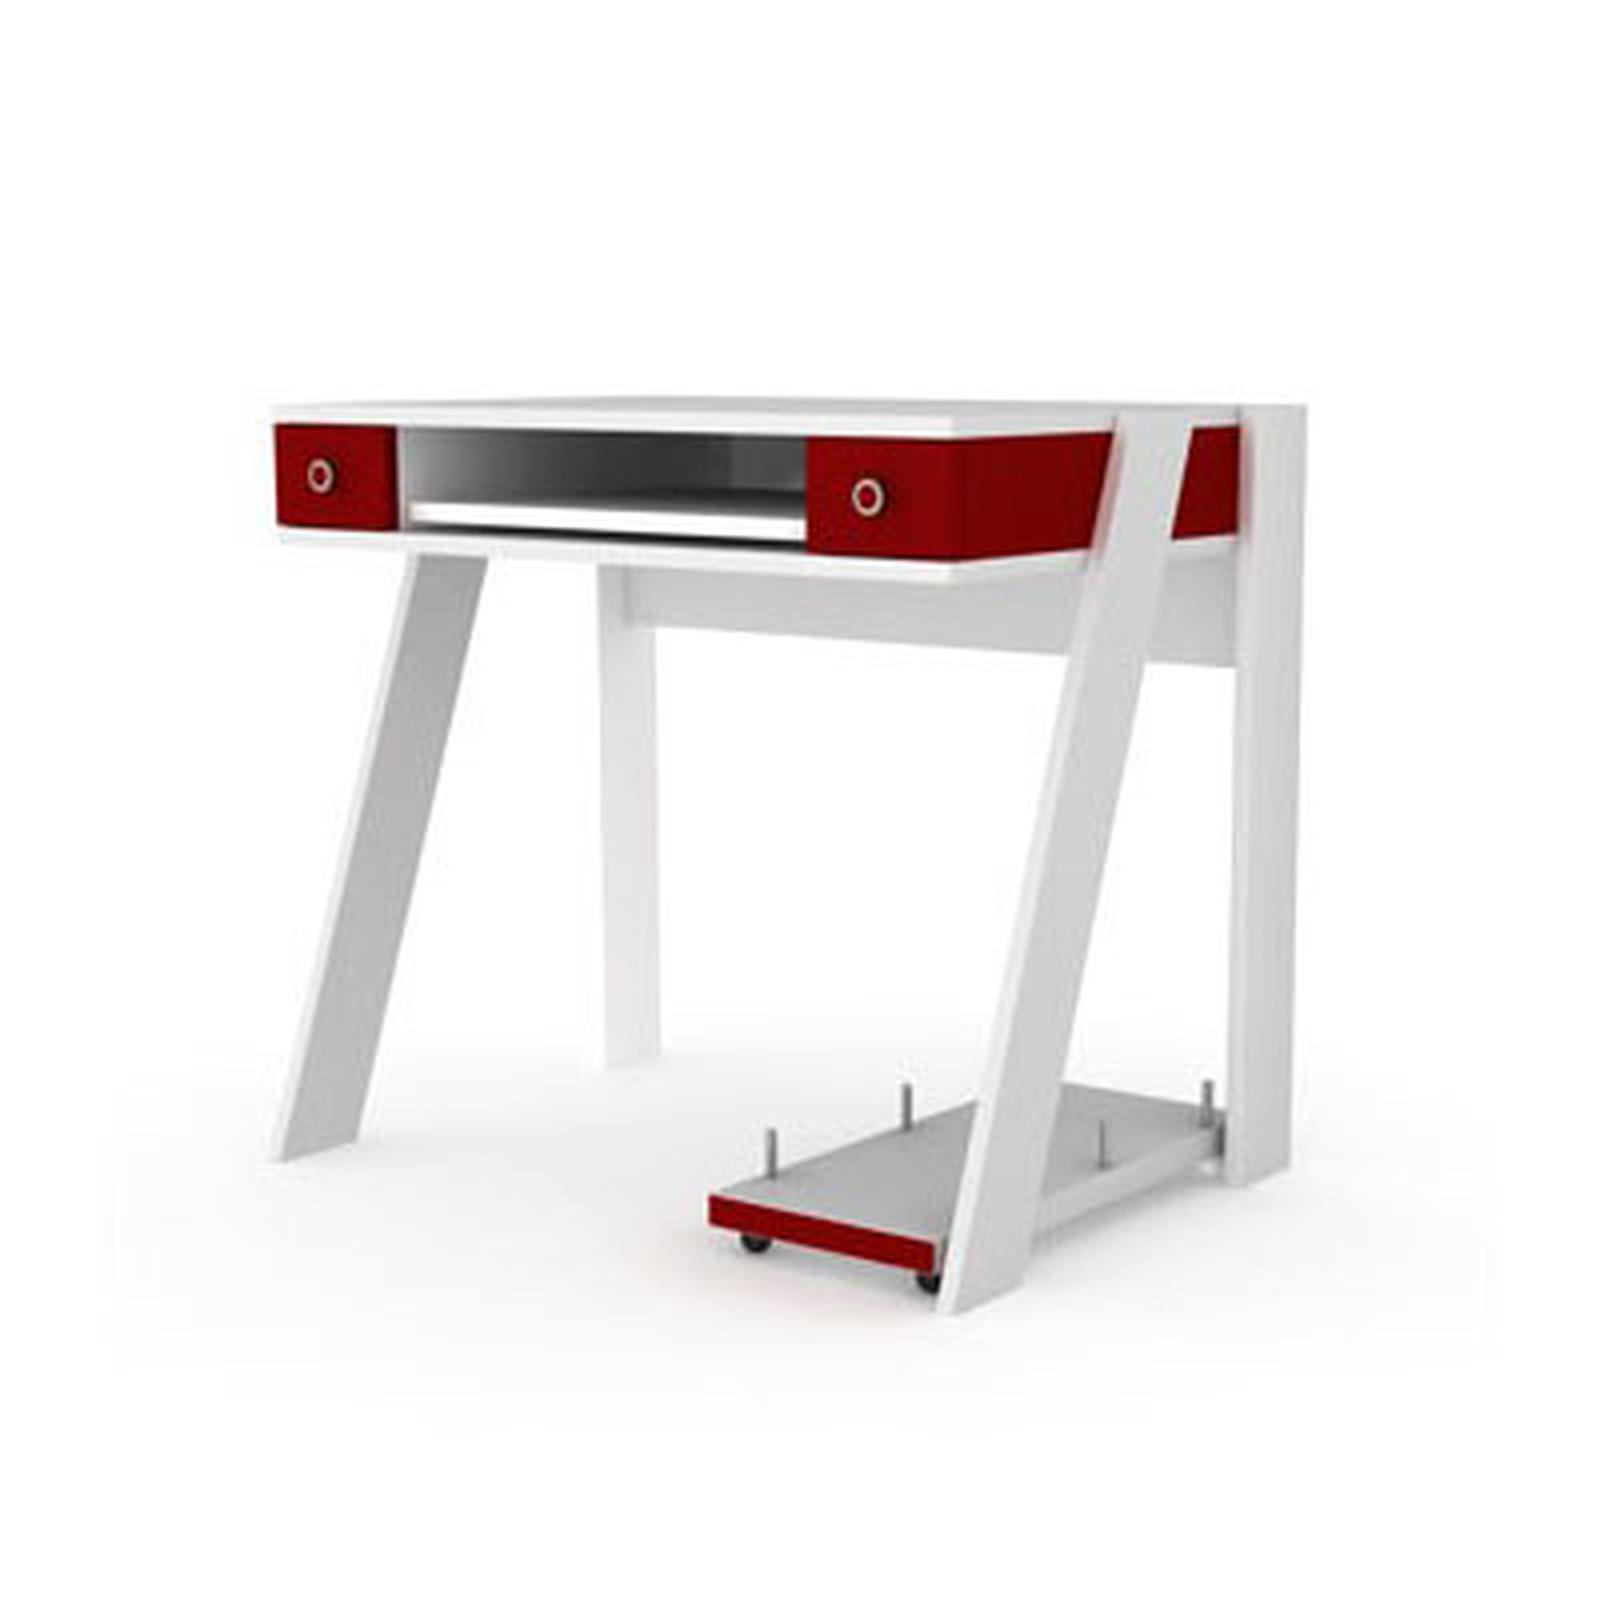 Elmob computer desk cd 210 05 blanc rouge meuble ordinateur elmob sur - Meuble ordinateur design ...